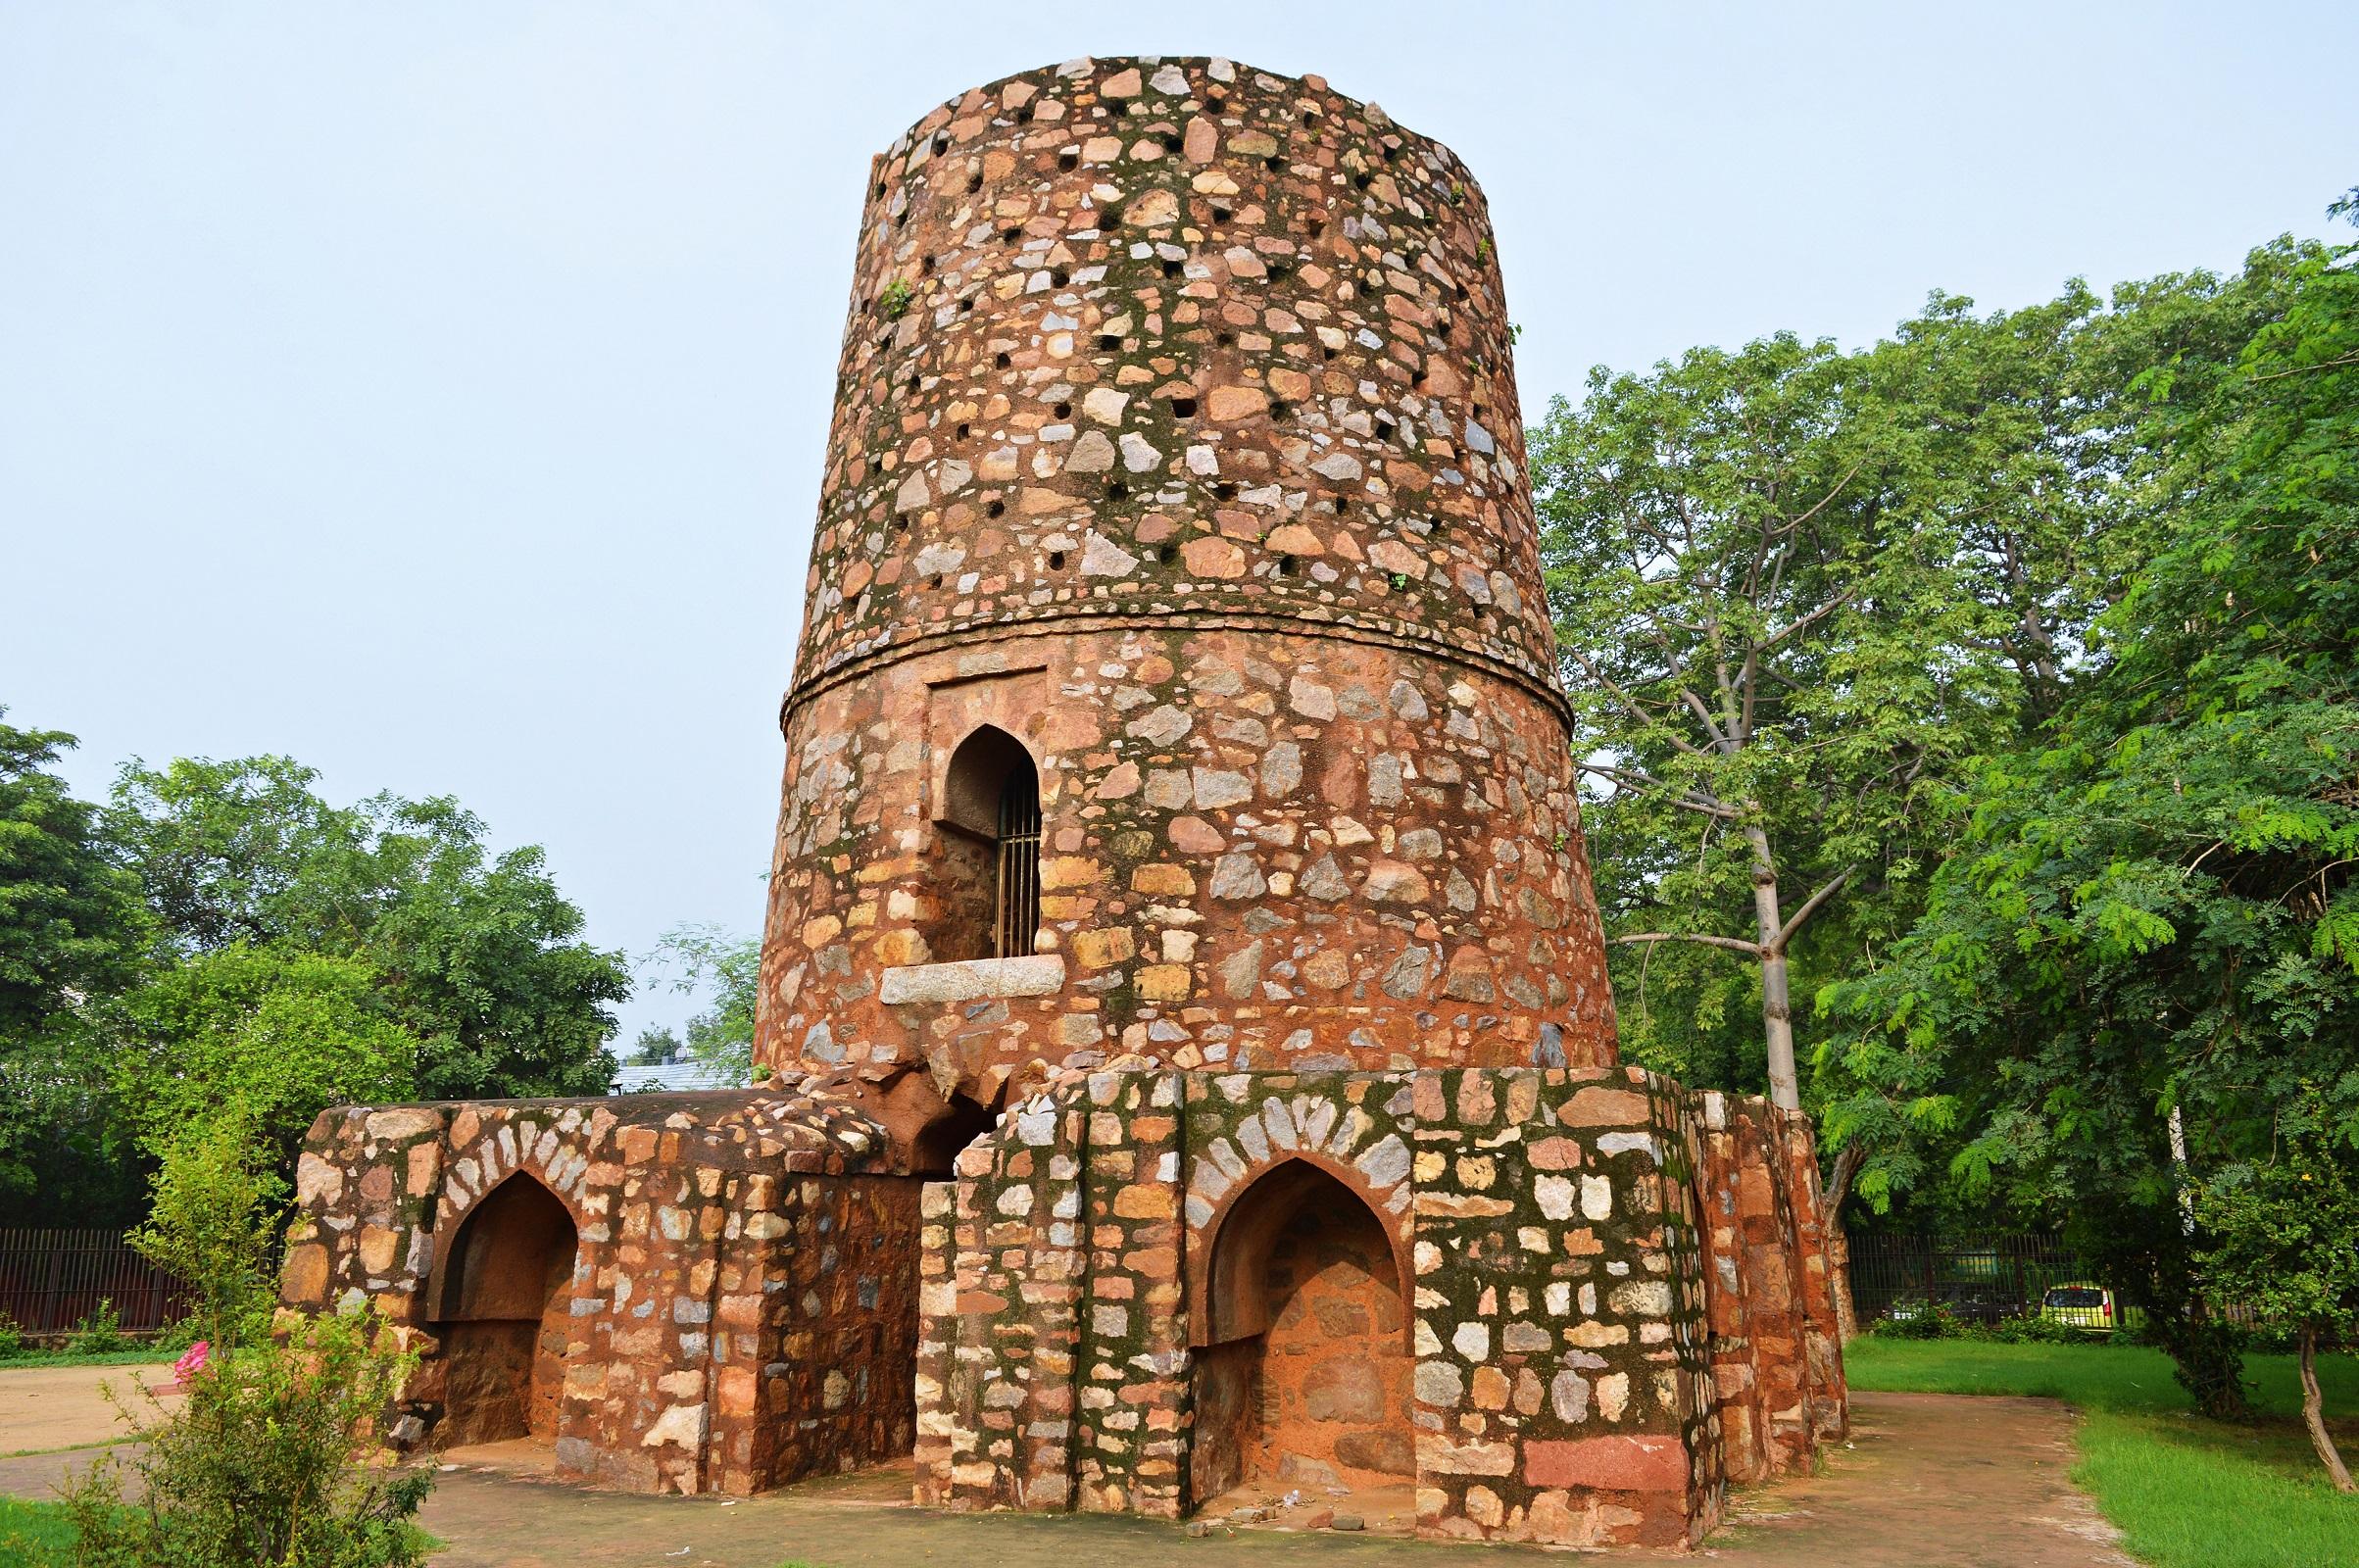 Sunken City Siri: Alauddin Khilji's Dar-ul Khilafat – My Heritage Walks